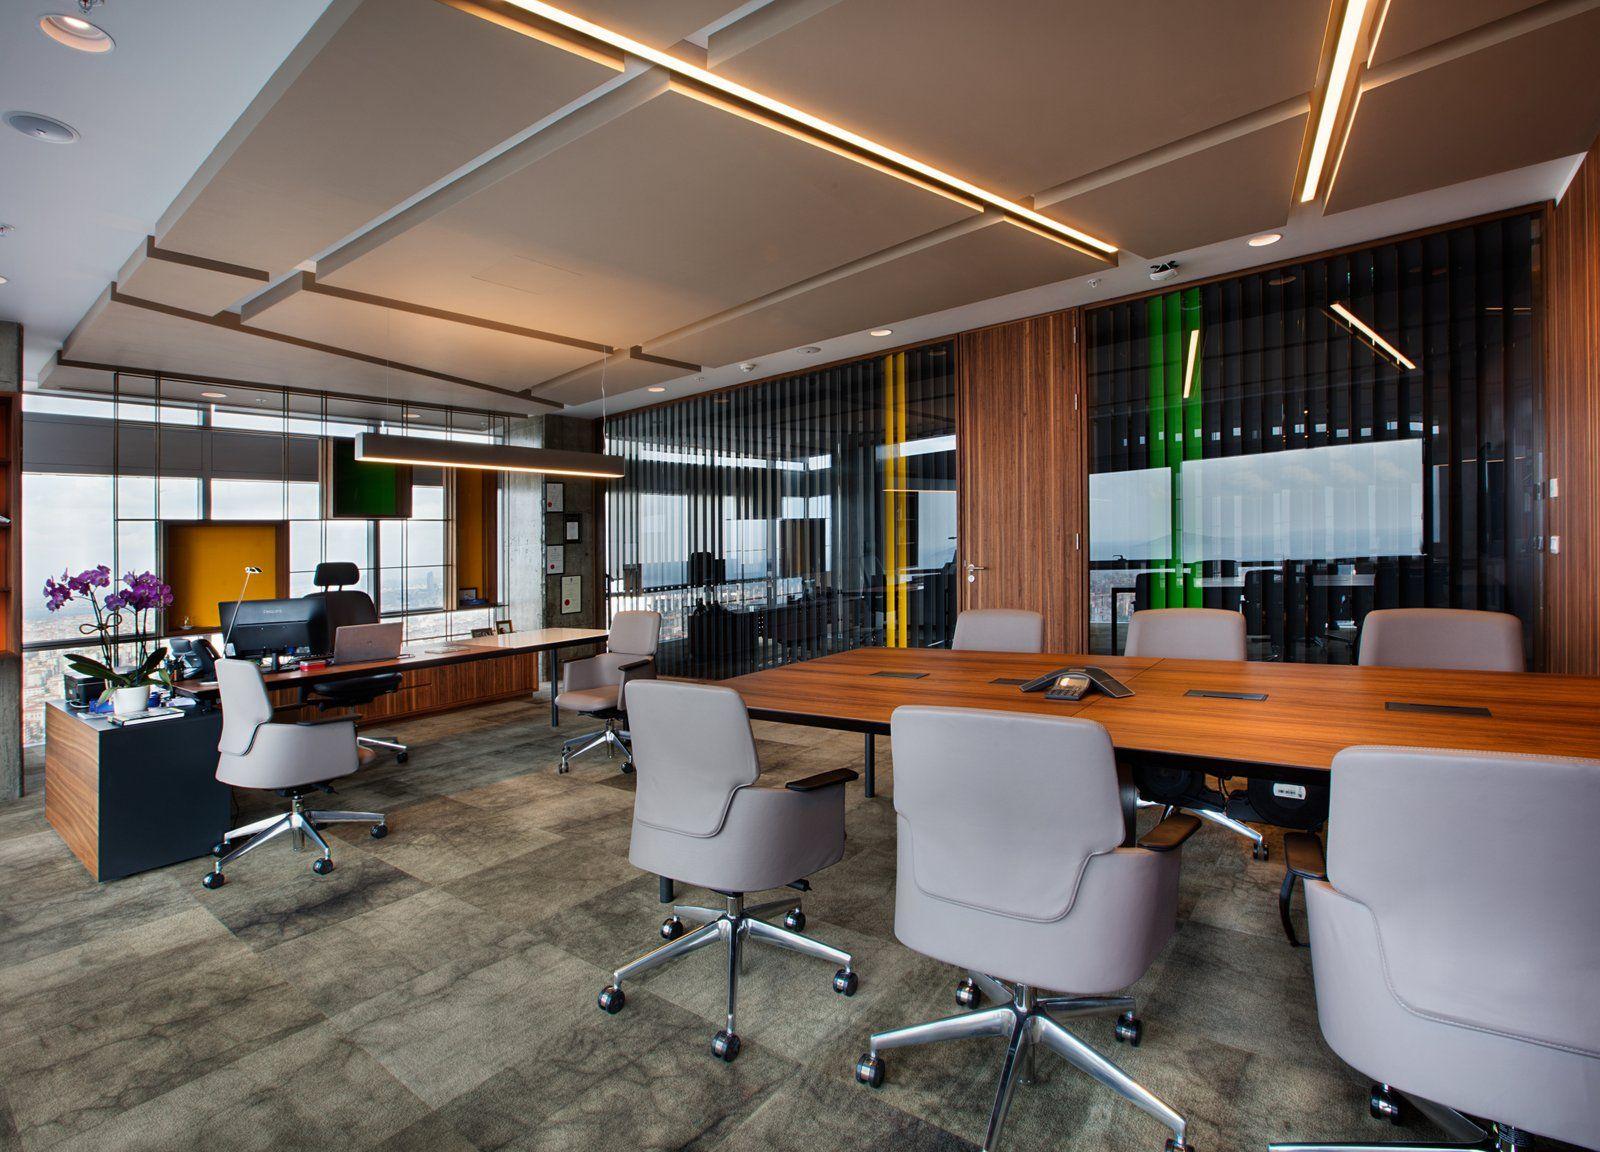 Cigna Finance Offices Istanbul Office Snapshots Office Interiors Office Design Design